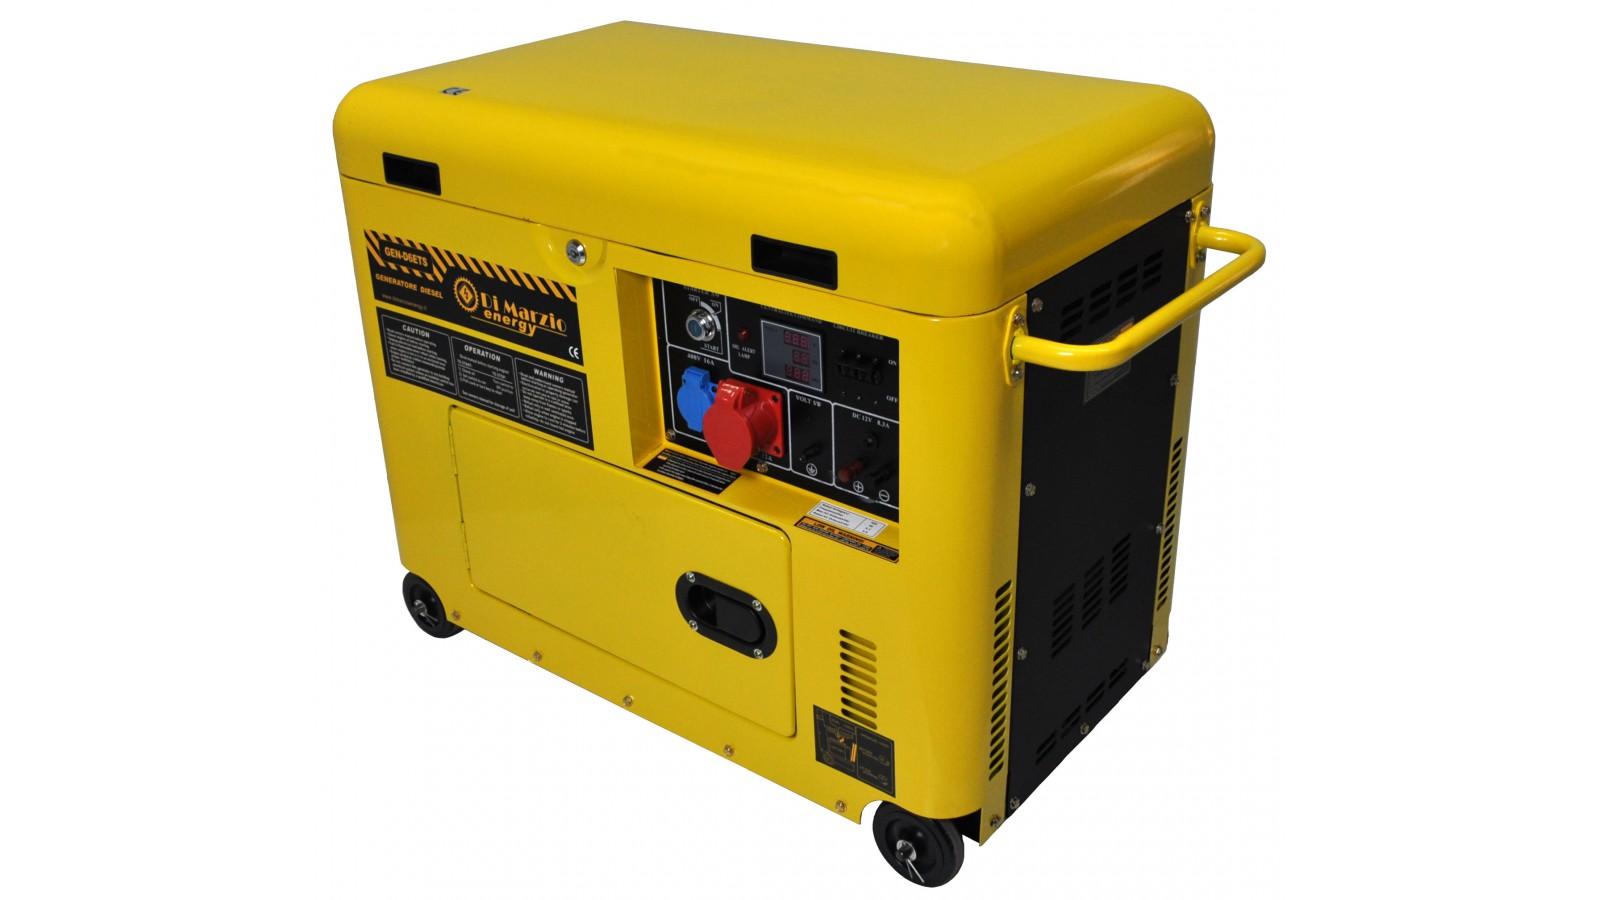 Generatore di corrente diesel 6 kw trifase silenziato for Generatore di corrente diesel usato